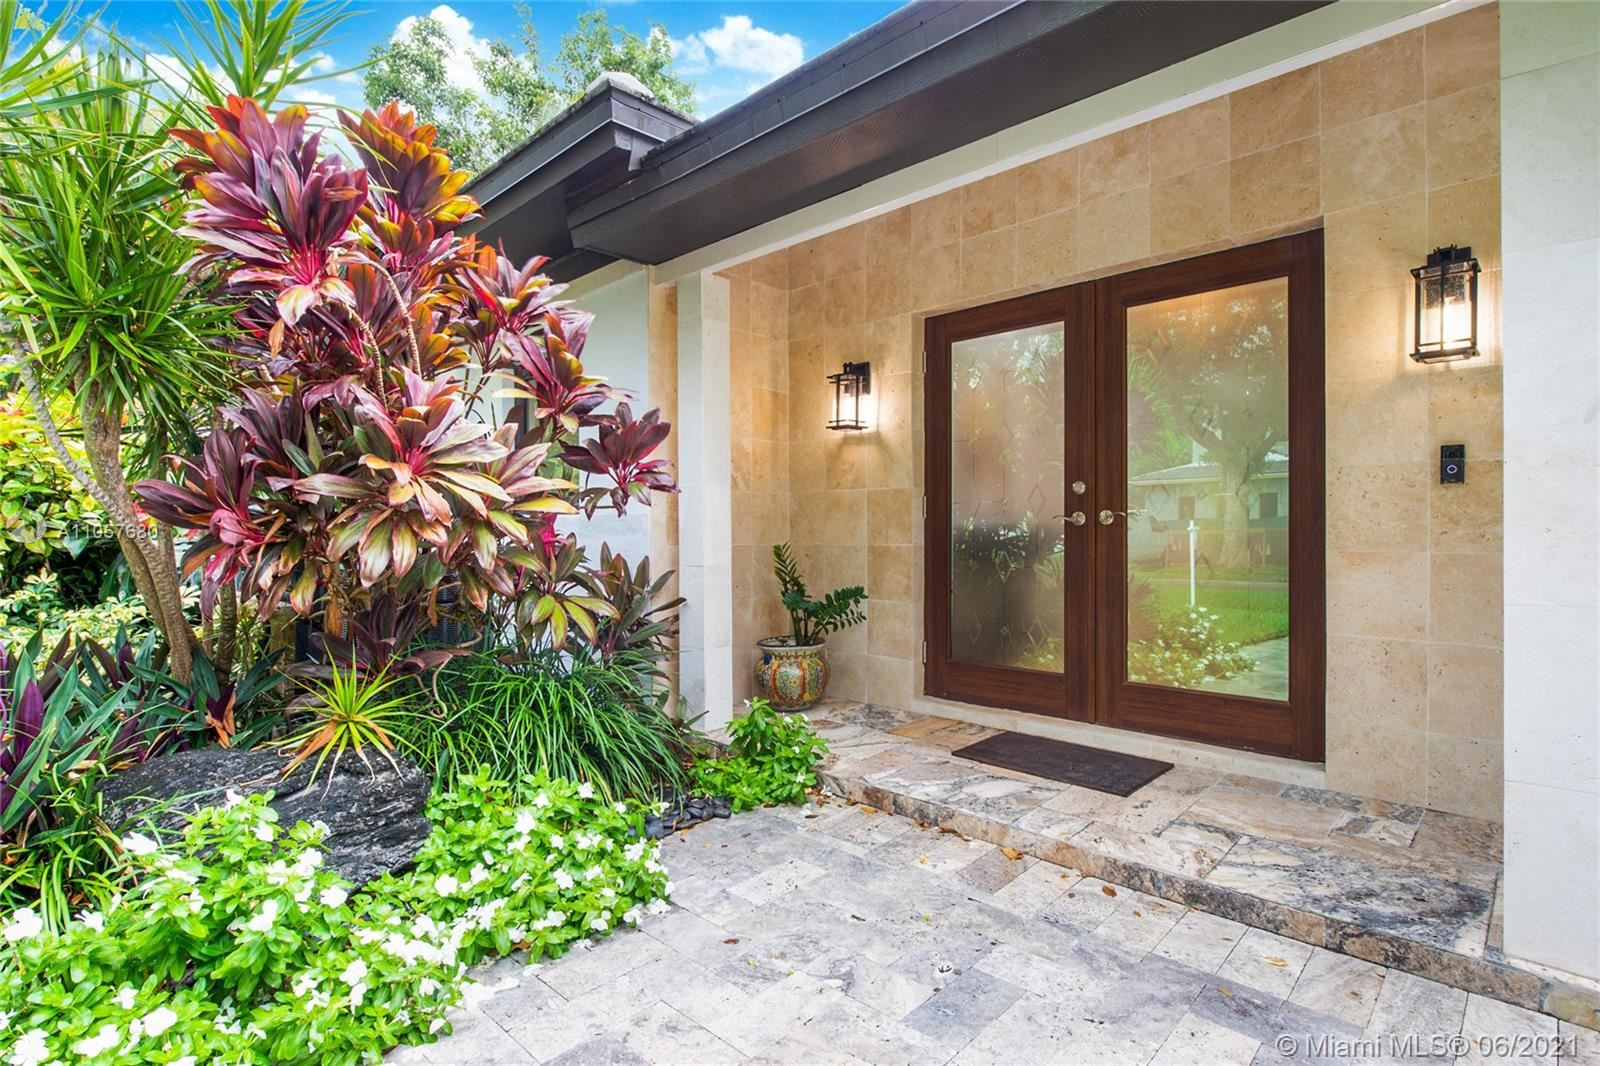 410 Caligula Ave, Coral Gables, FL 33146 - #: A11057680